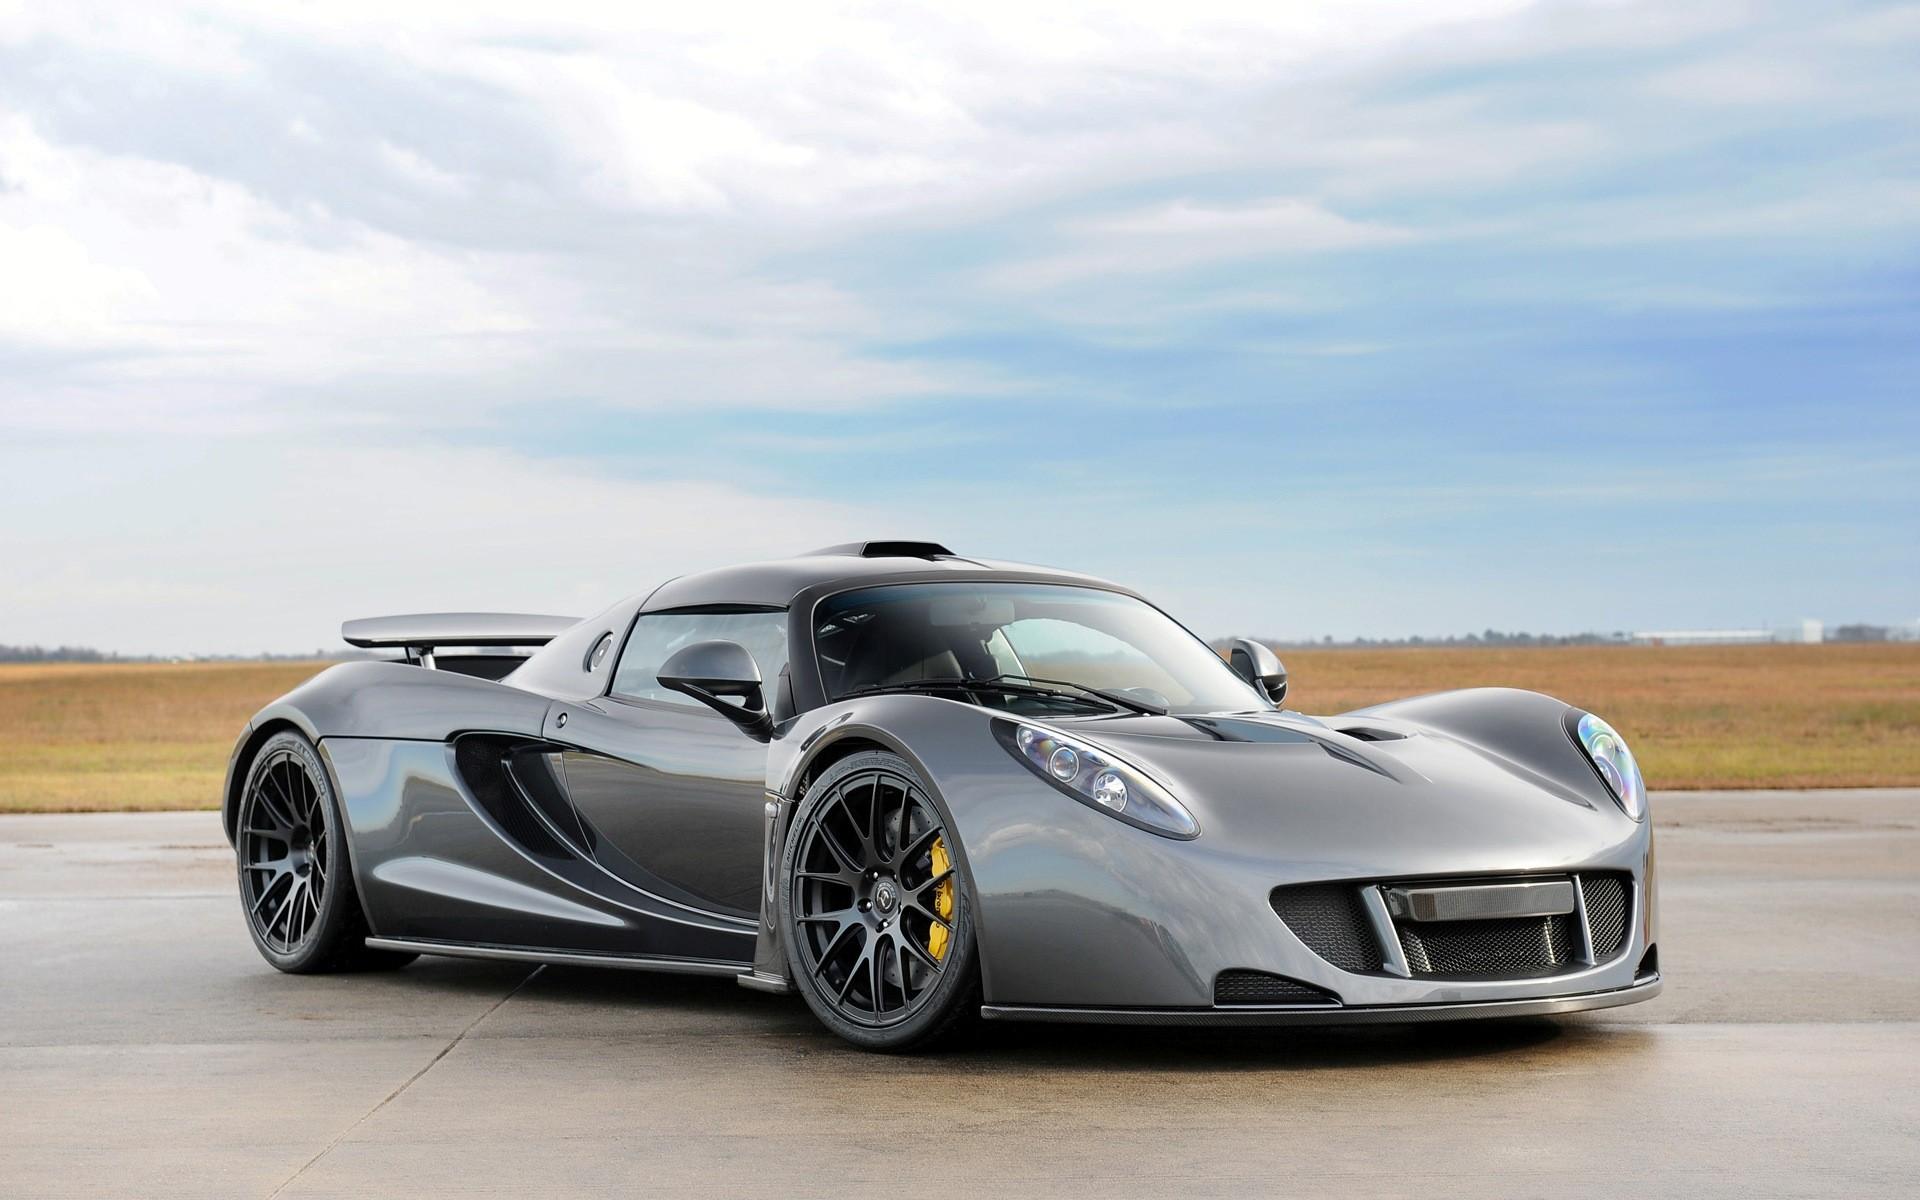 Wallpaper Sports Car Hennessey Venom Gt Lotus Exige